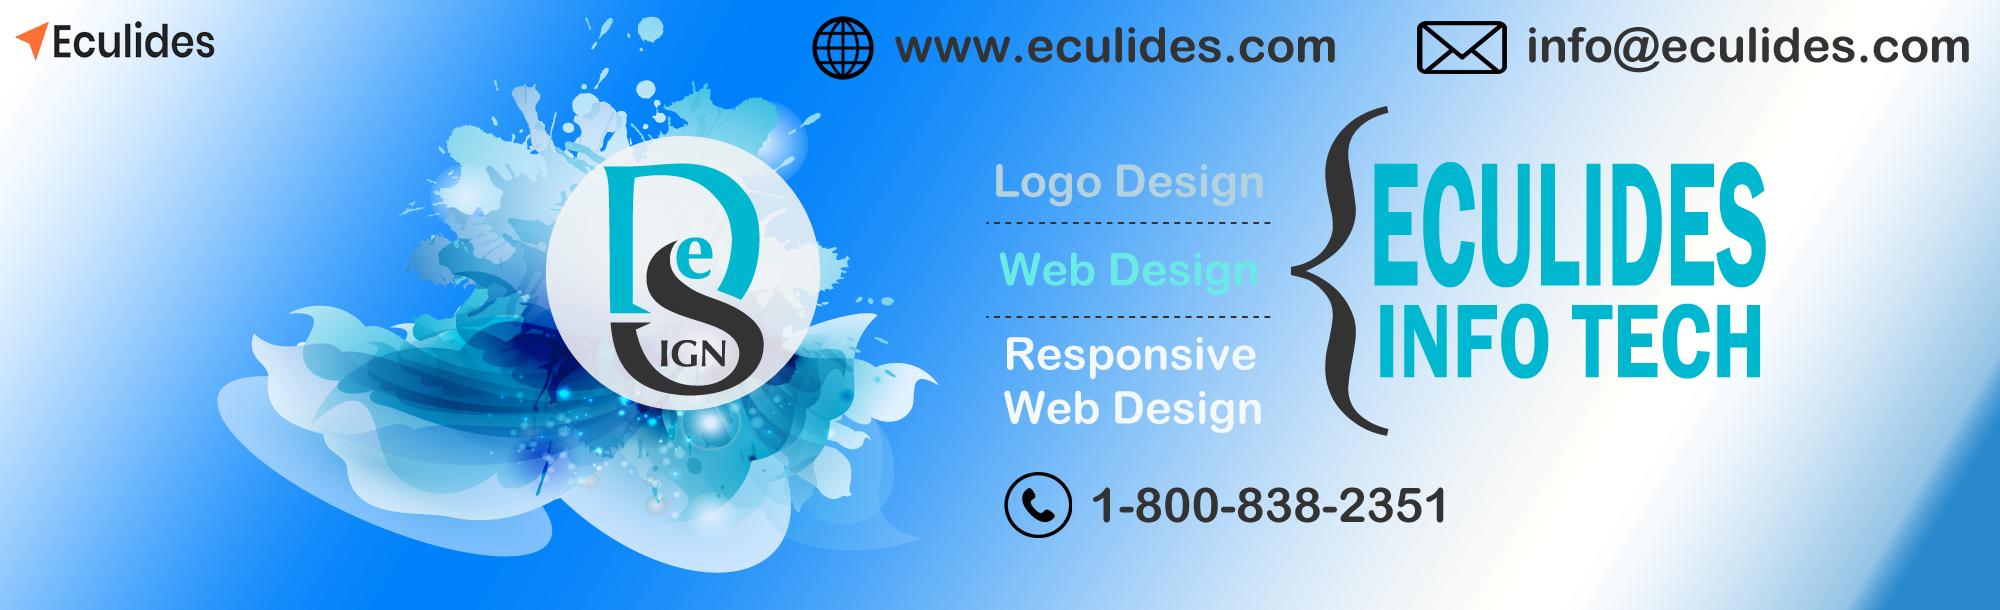 Eculide Infotech Is Best Web Design Company In Usa Which Provides Logodesign Websitedesign Webdesign Web Design Web Design Company Web Development Design